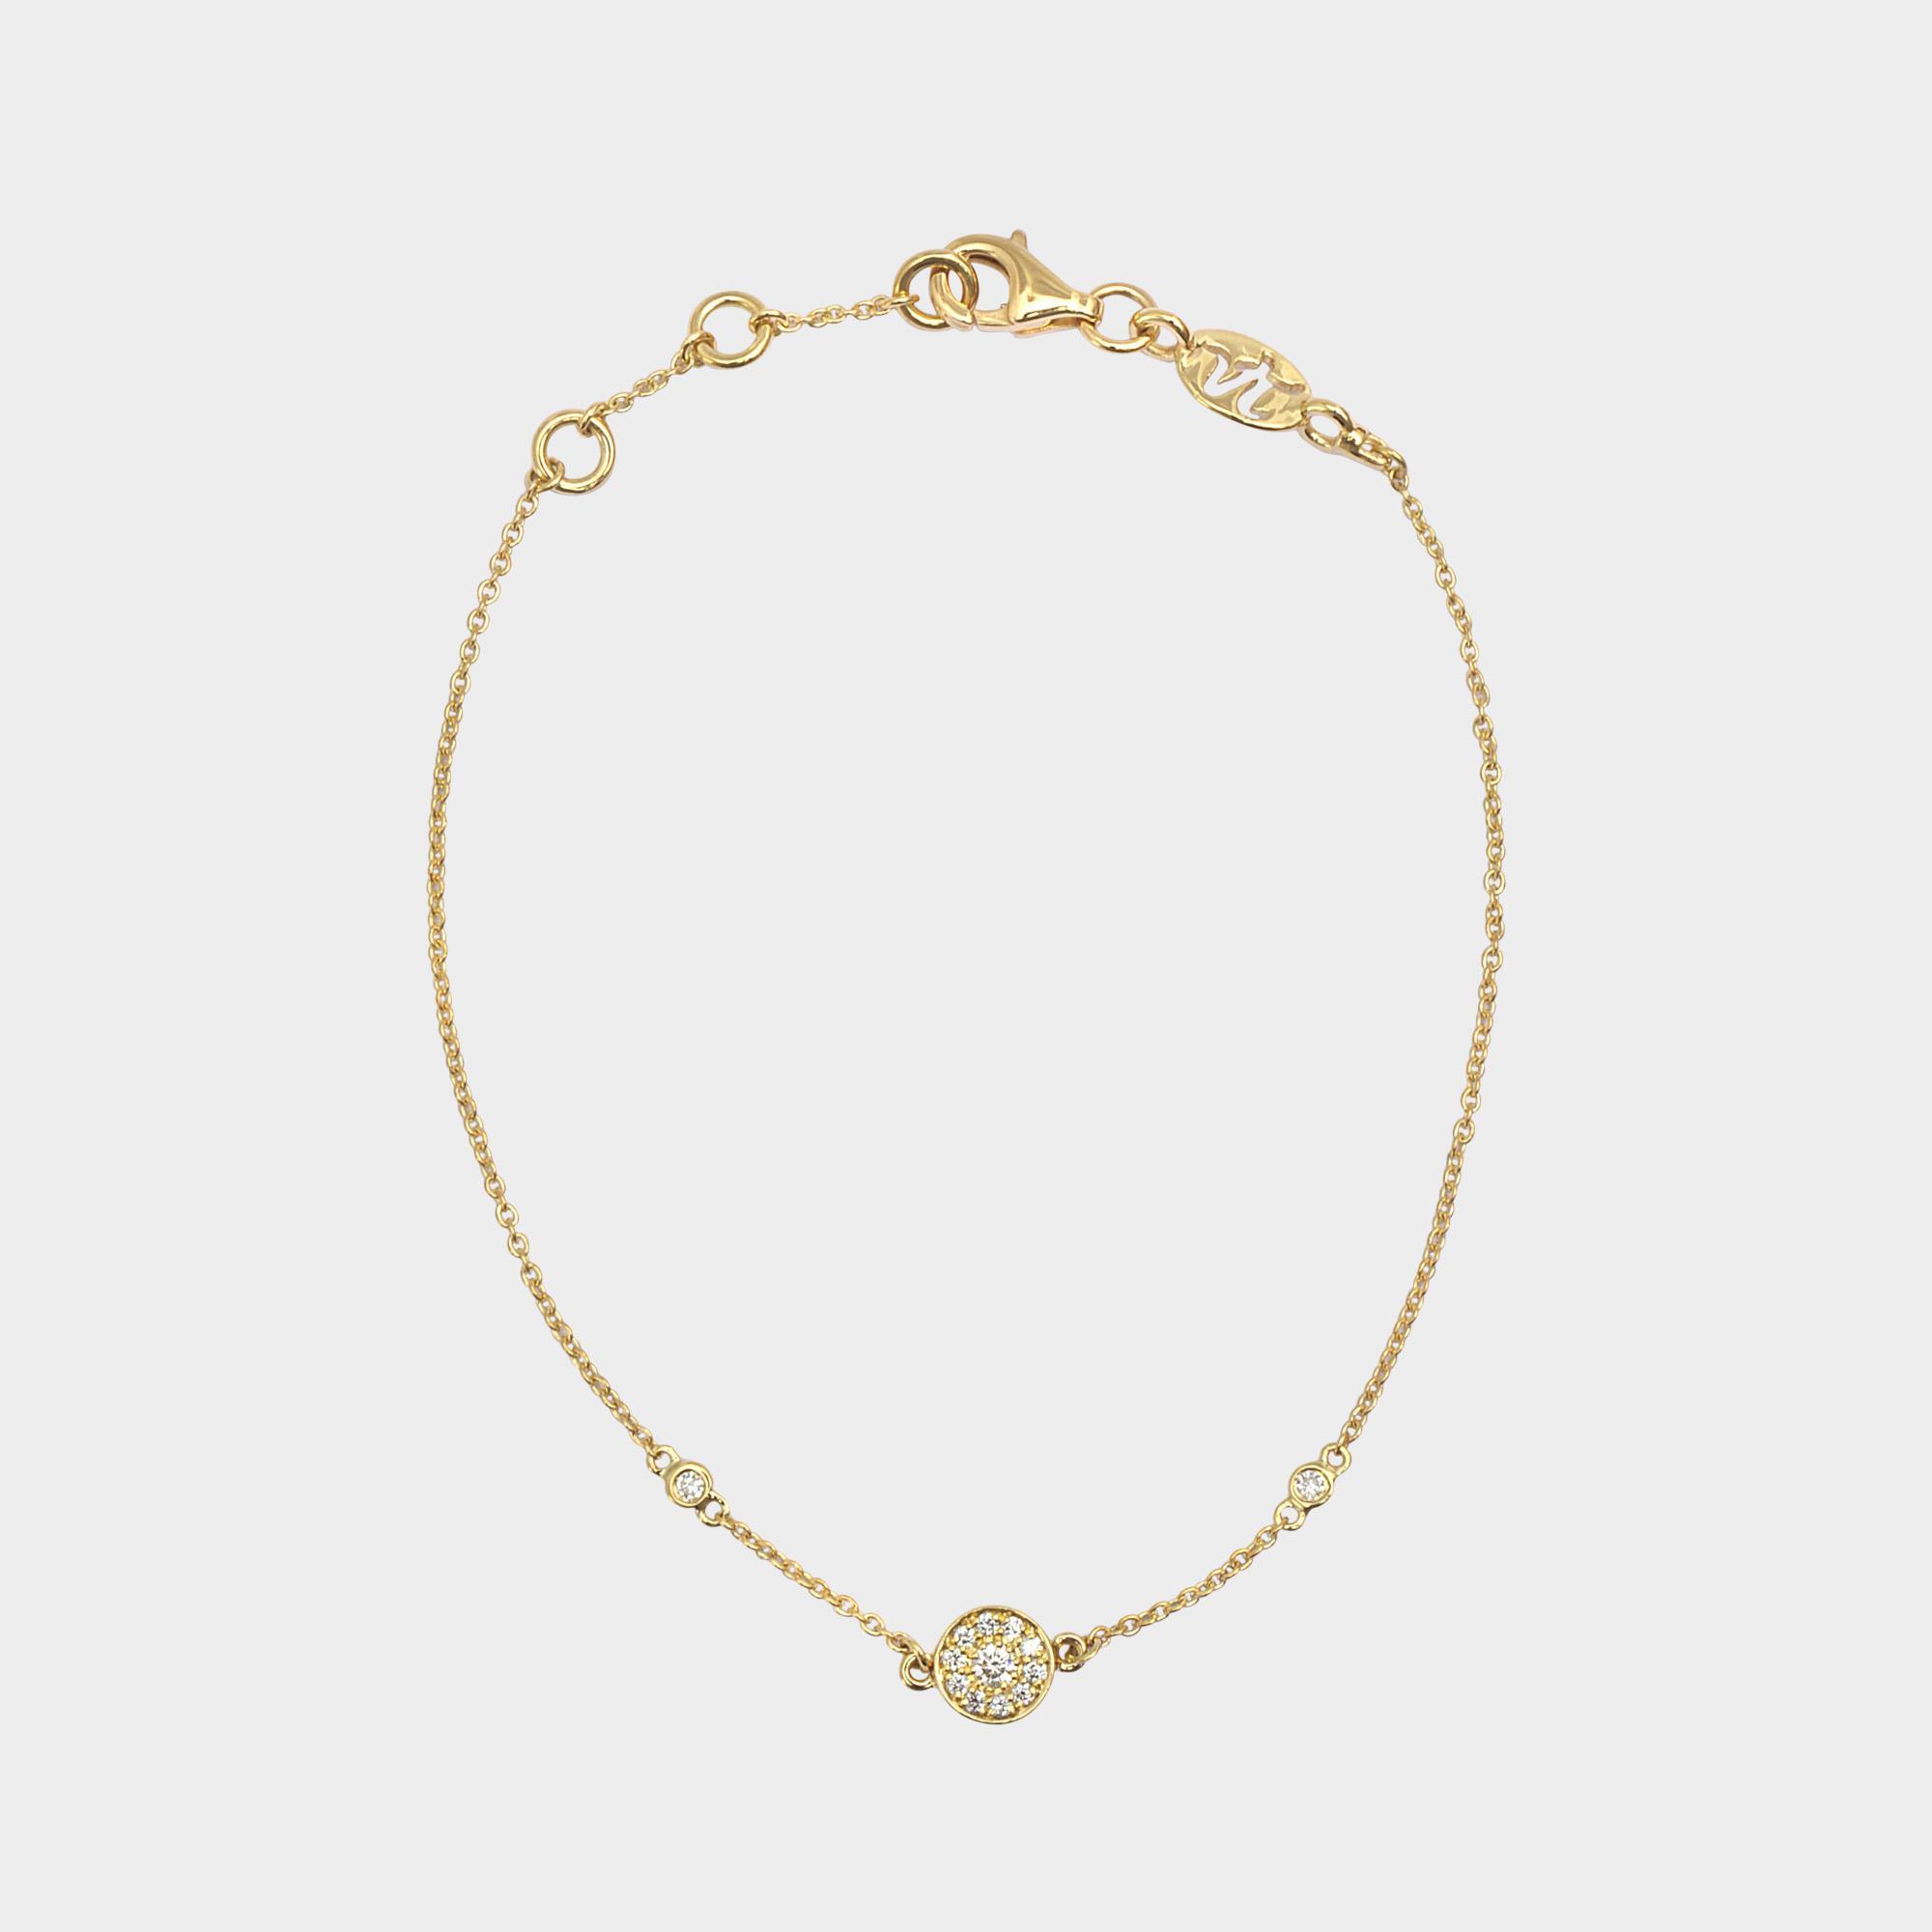 Or Jaune Et Bracelet Charme Diamant Rond Vanessa Tugendhaft X57pu9x5iF